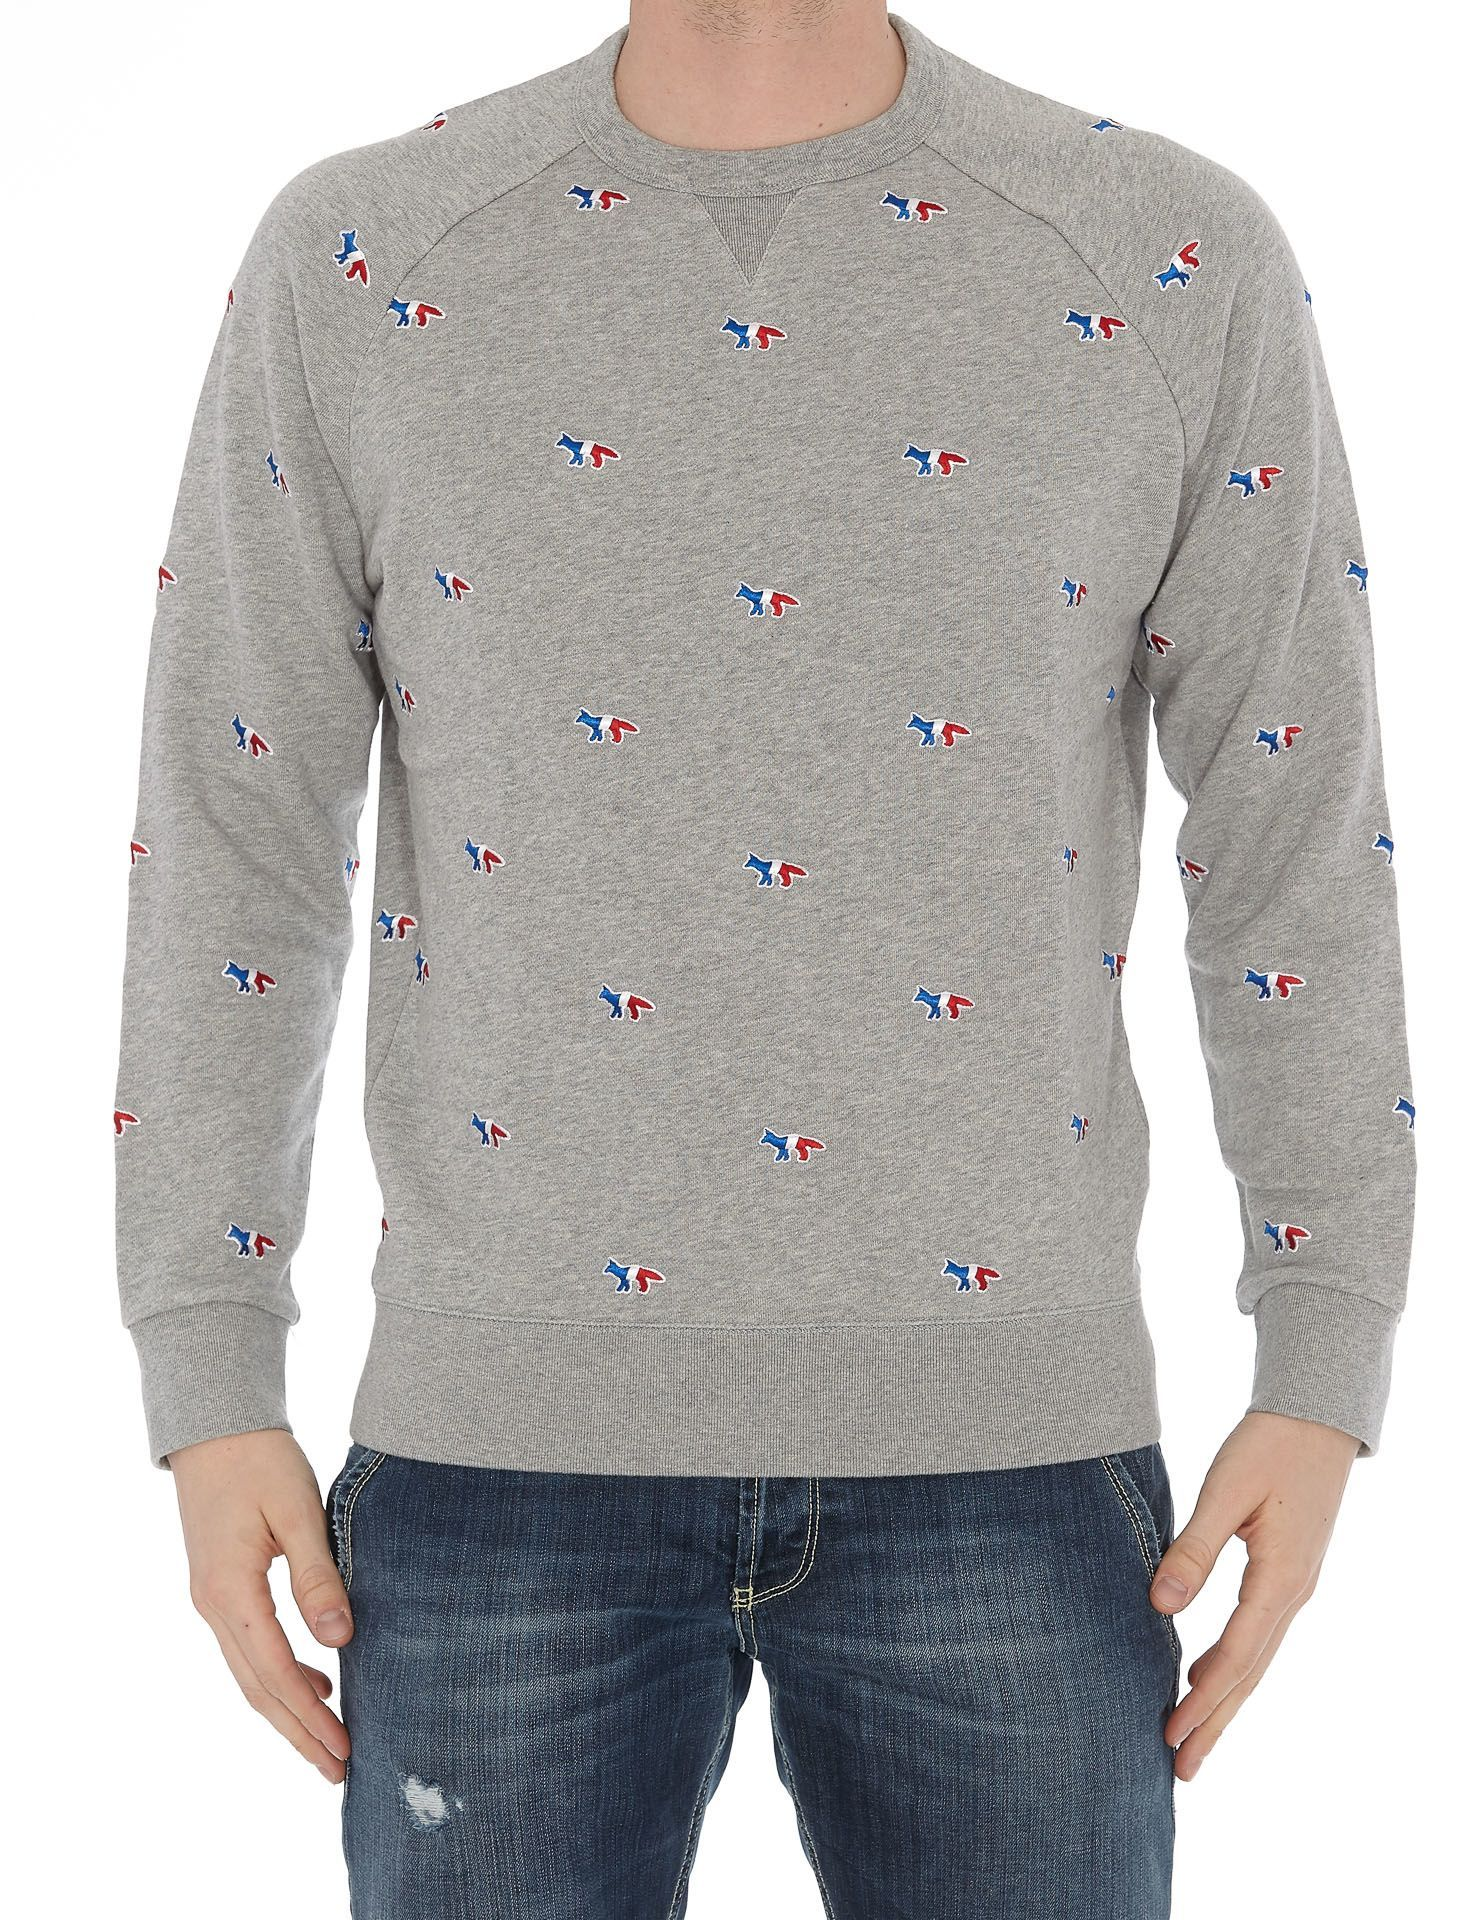 Maison Kitsune Sweatshirt All Over Tricolor Fox Maisonkitsune Cloth Sweatshirts Kitsune Maison Maison Kitsune [ 1920 x 1482 Pixel ]